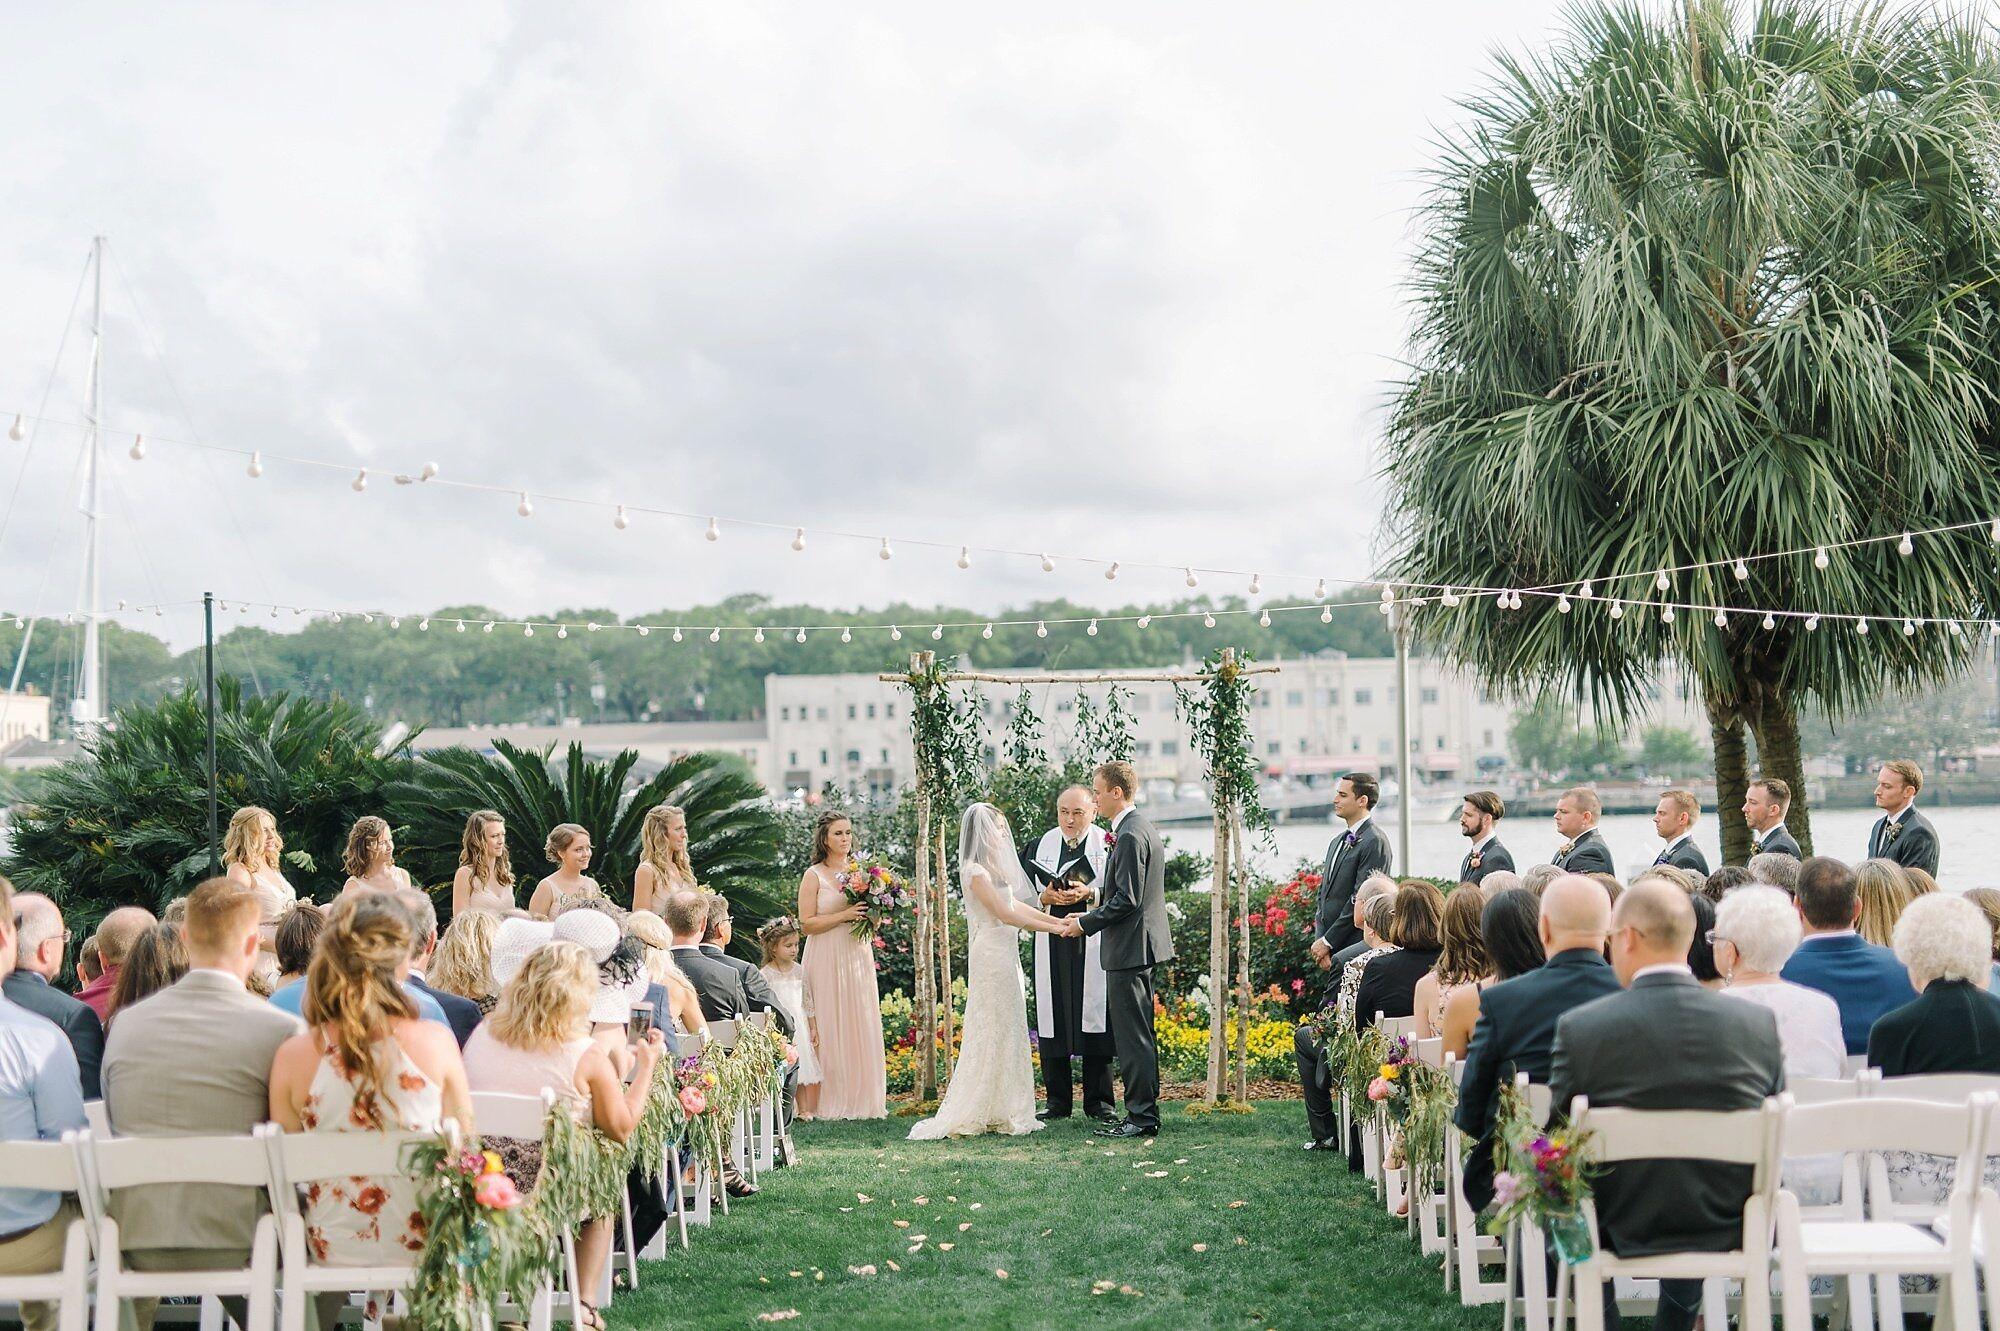 Wedding reception venues in savannah ga the knot the westin savannah harbor junglespirit Gallery